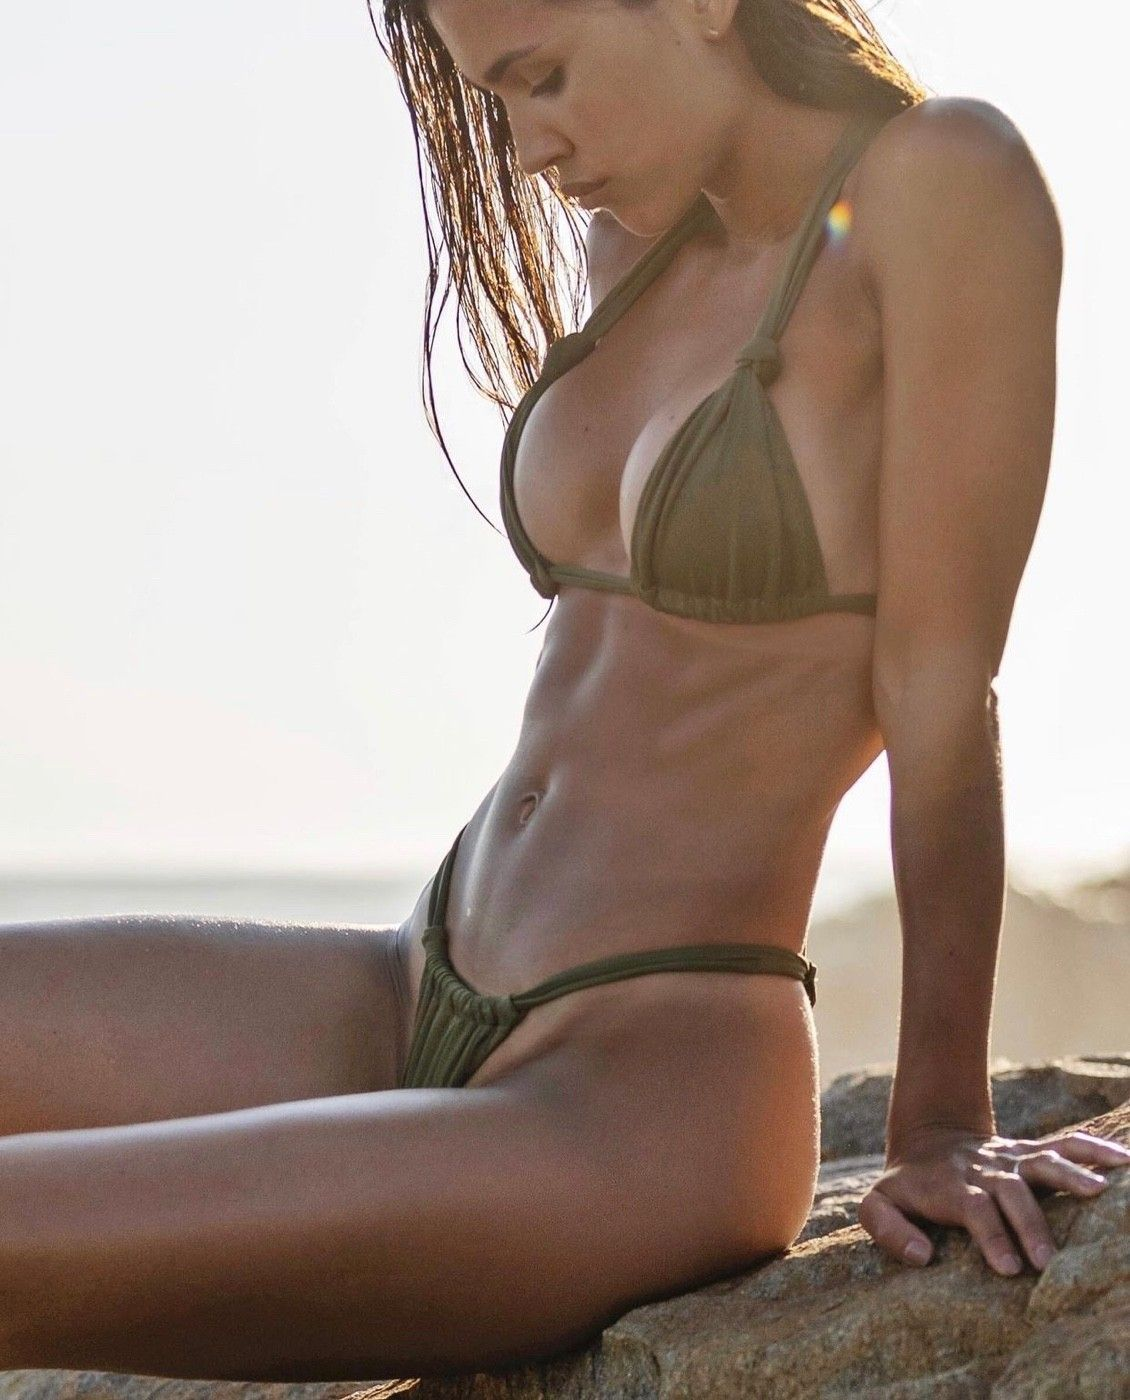 Click link to access Bikini Dolls IG